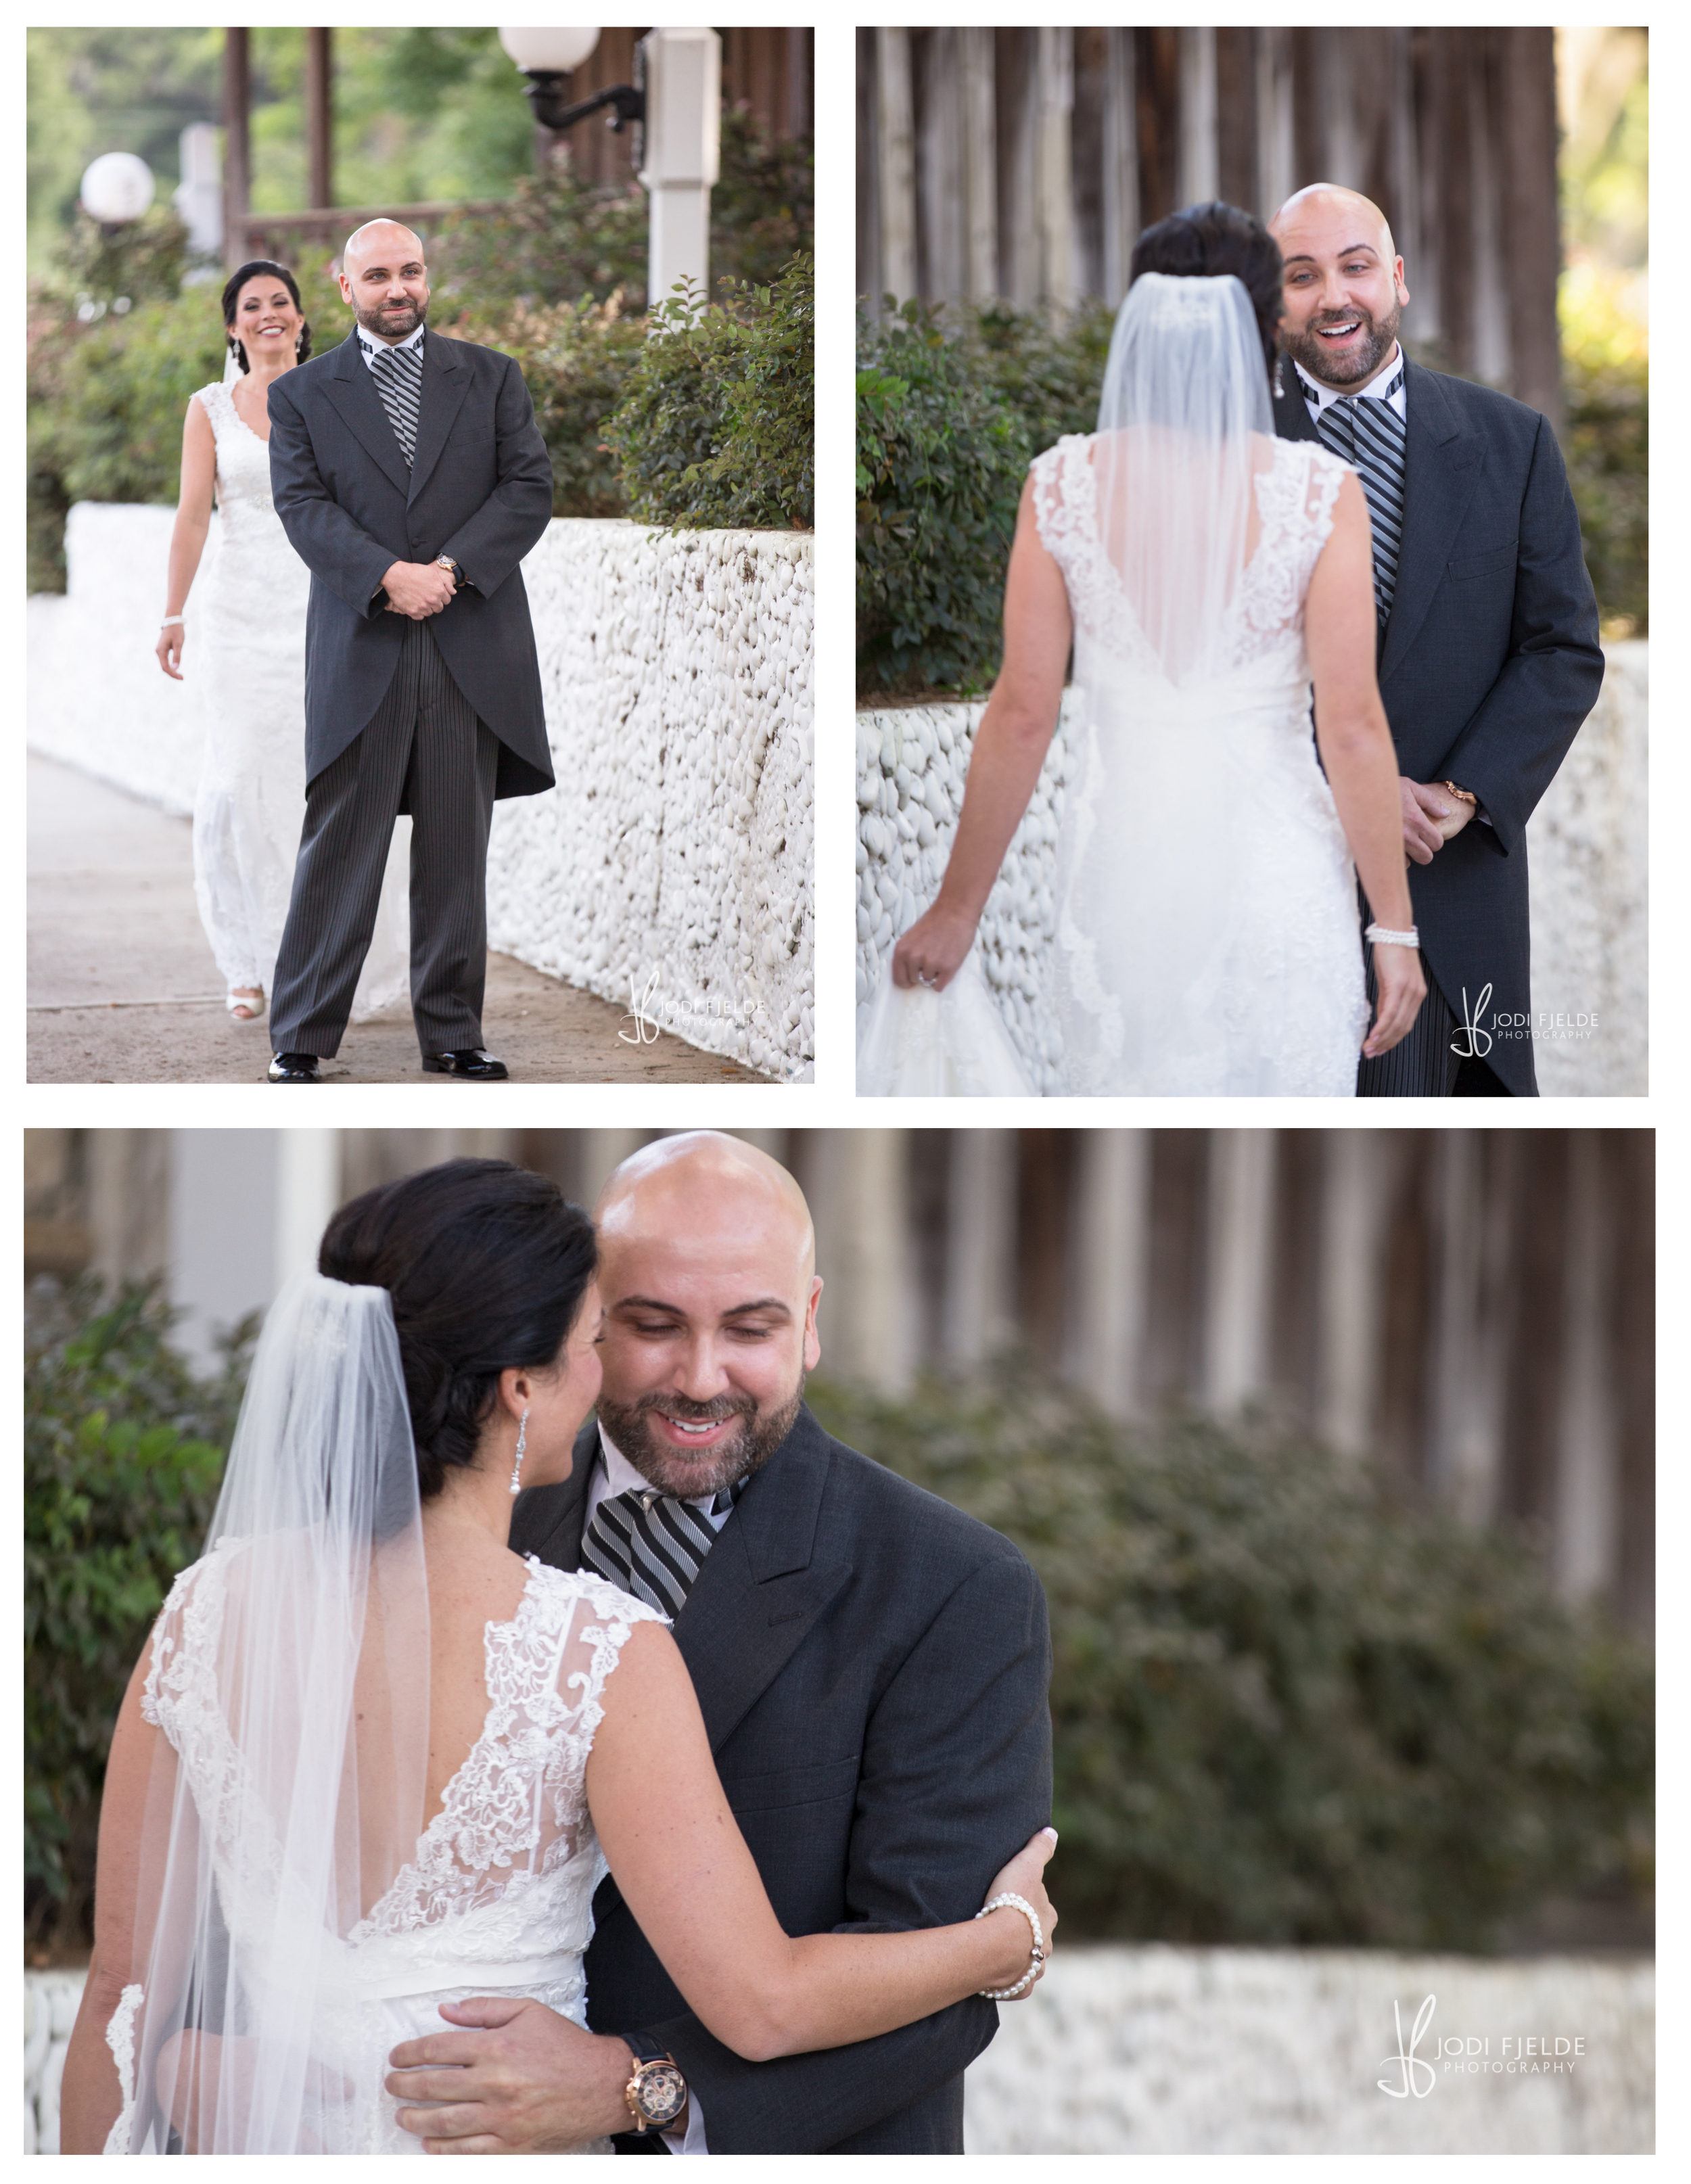 Highland_Manor_Apopka_Florida_wedding_Jackie_&_Tim_photography_jodi_Fjelde_photography-10.jpg